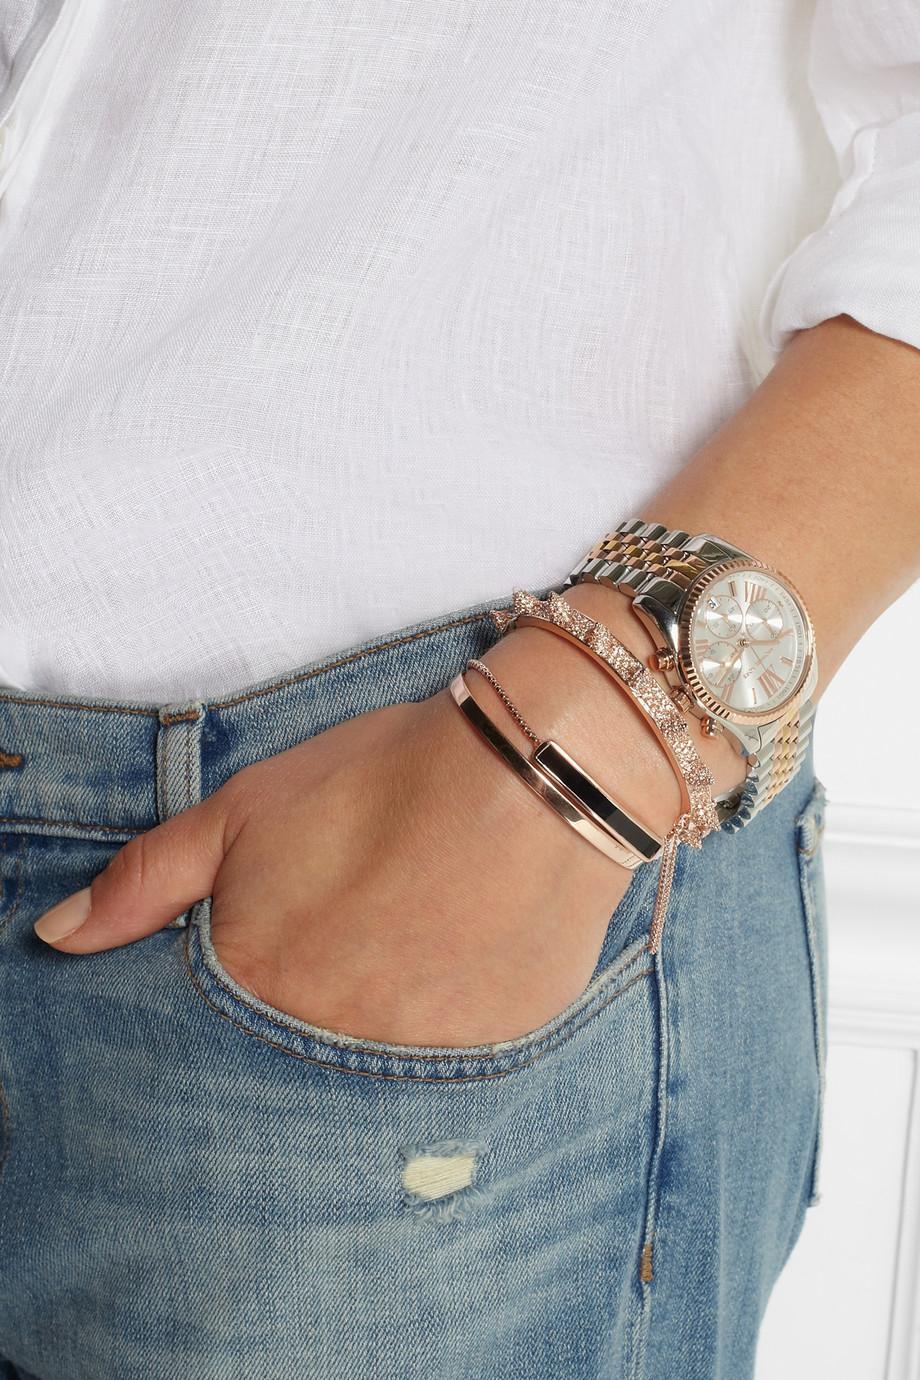 090ec5ca223d6 Lyst - Michael Kors Lexington Stainless Steel Chronograph Watch in Metallic